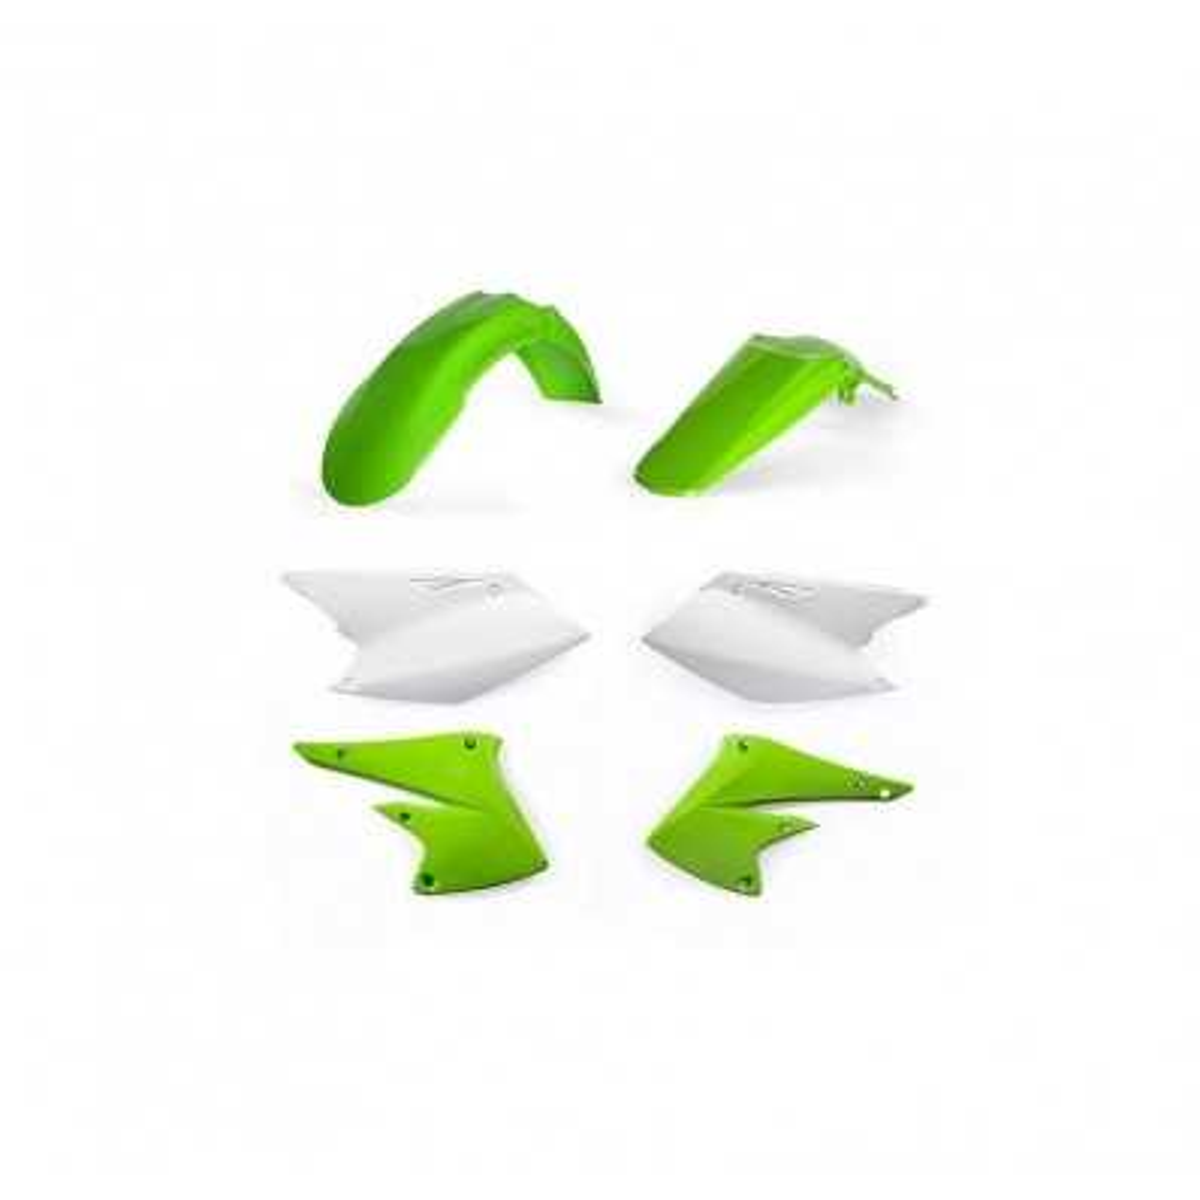 0013141-130 - Kit Plasticos Kxf 250 09 12 Verde